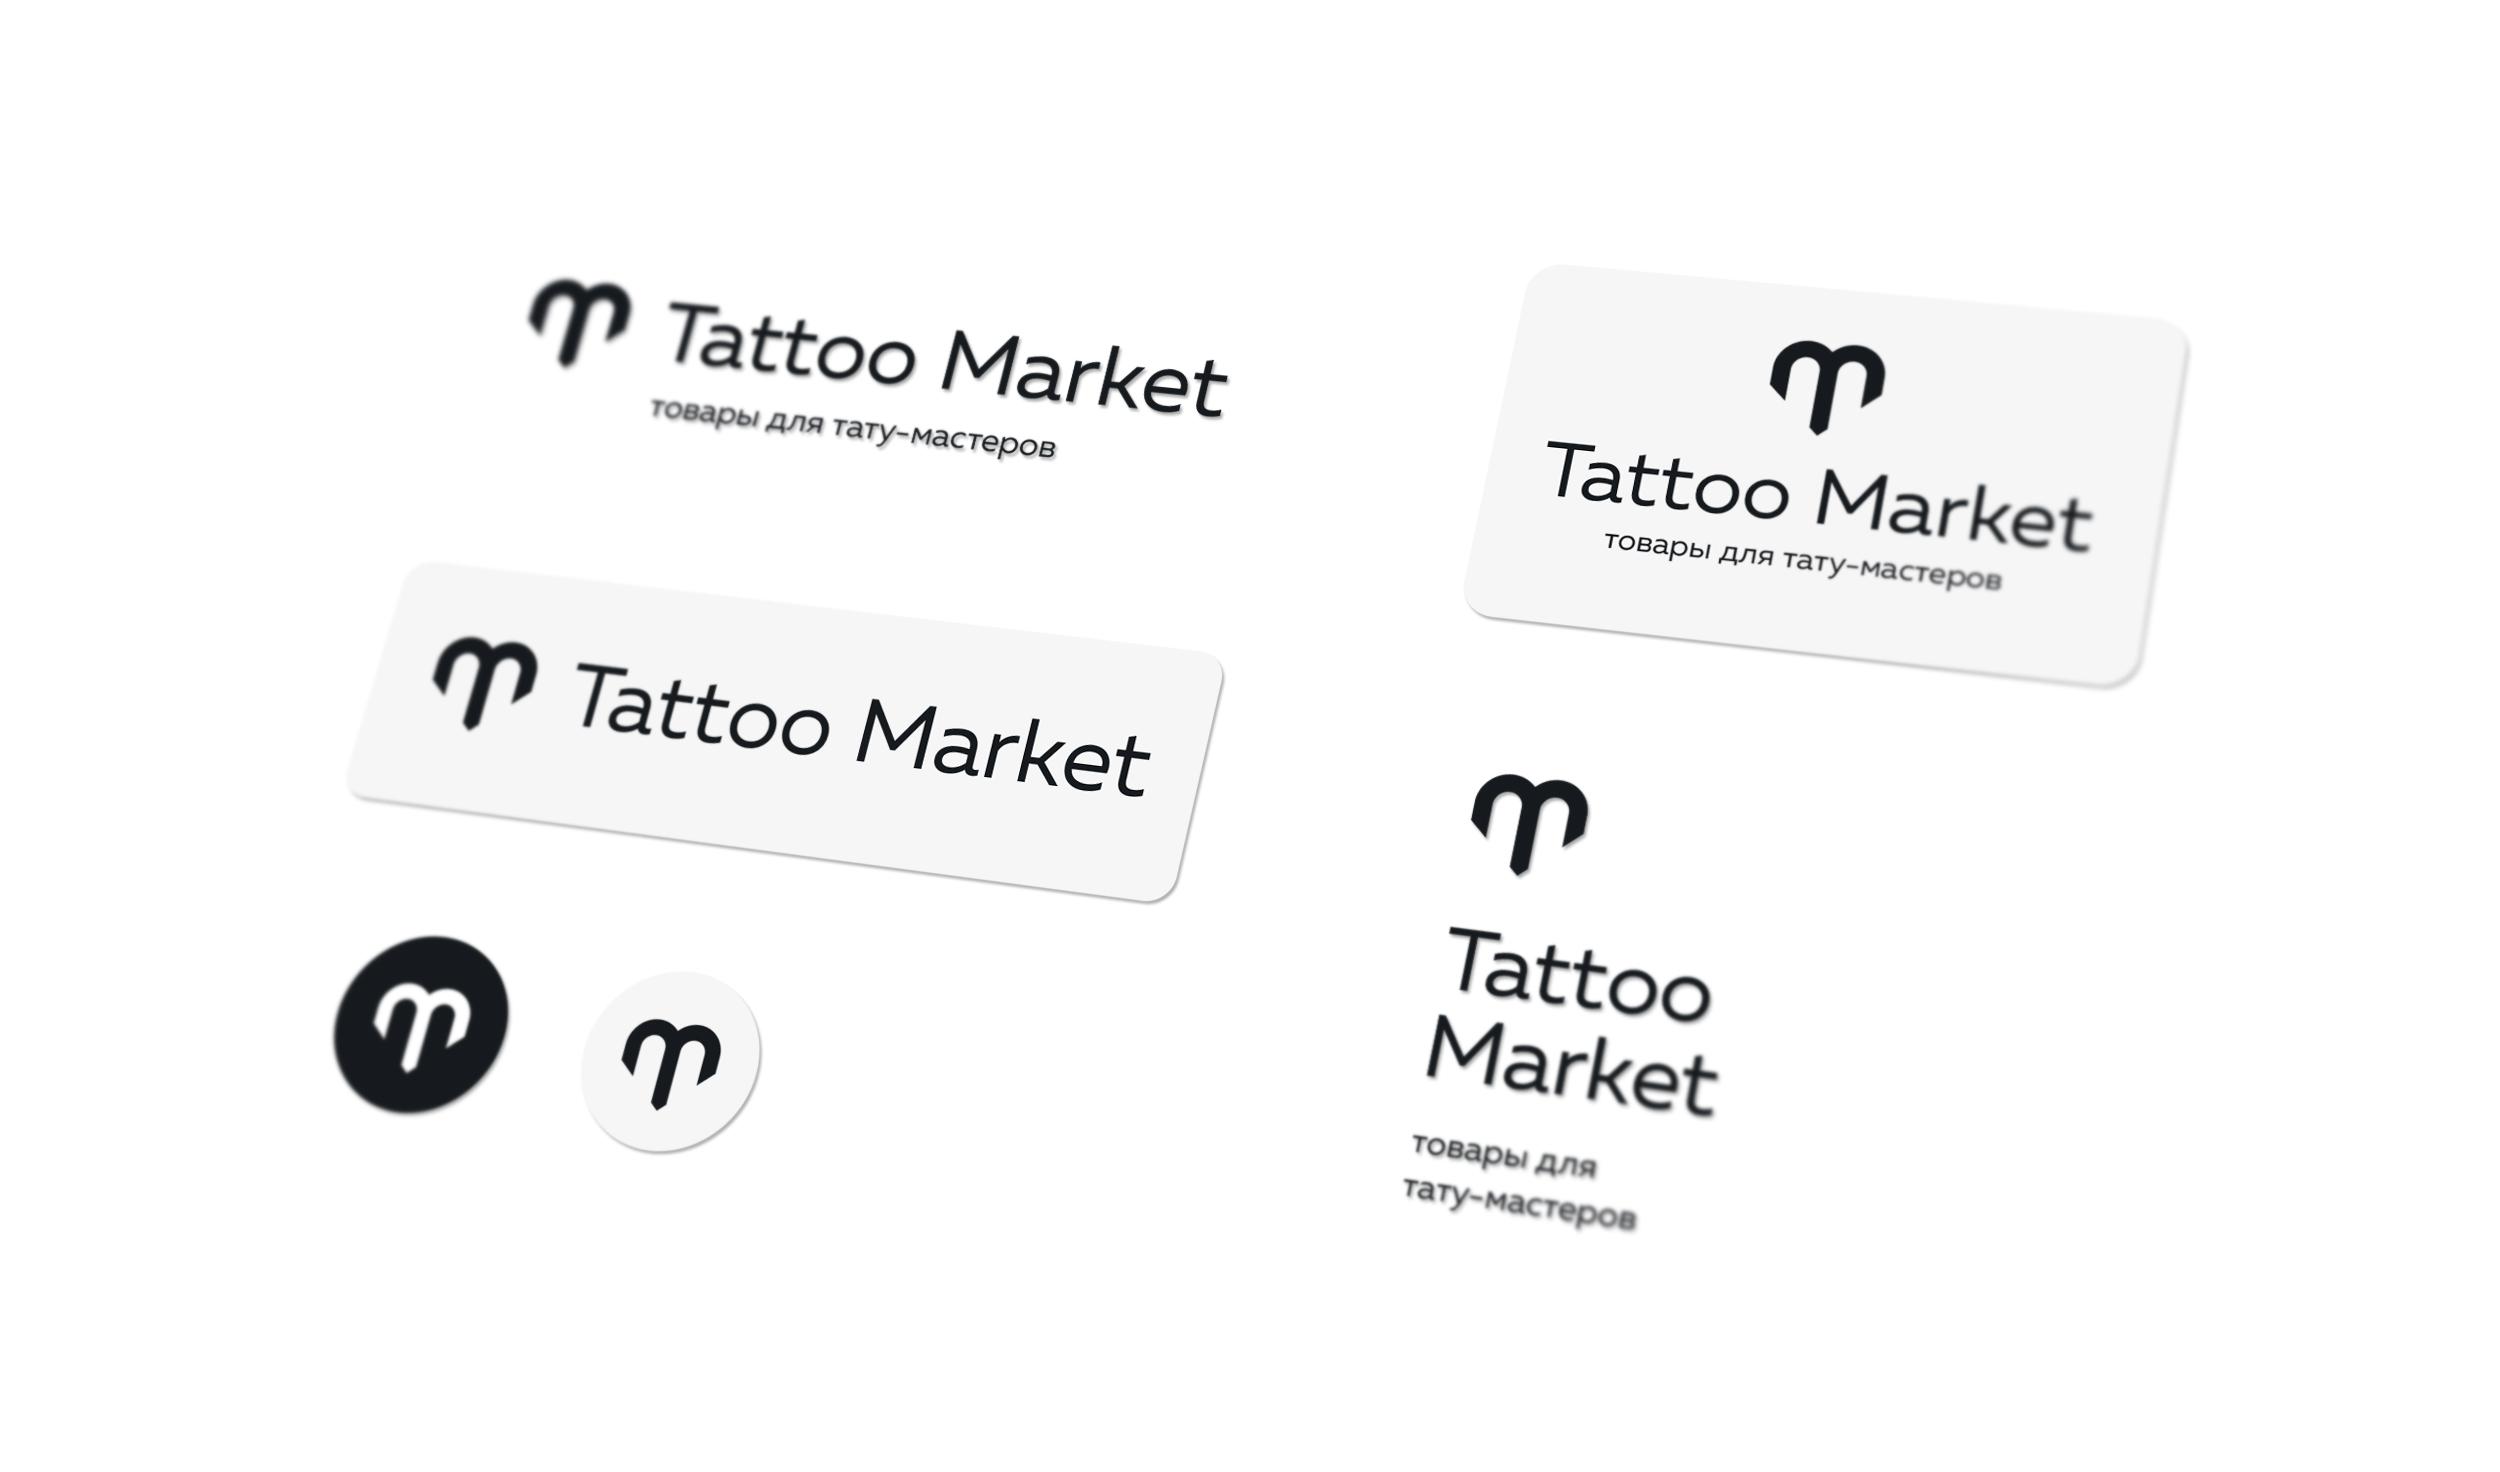 Редизайн логотипа магазина тату оборудования TattooMarket.ru фото f_9985c38f2733df55.jpg